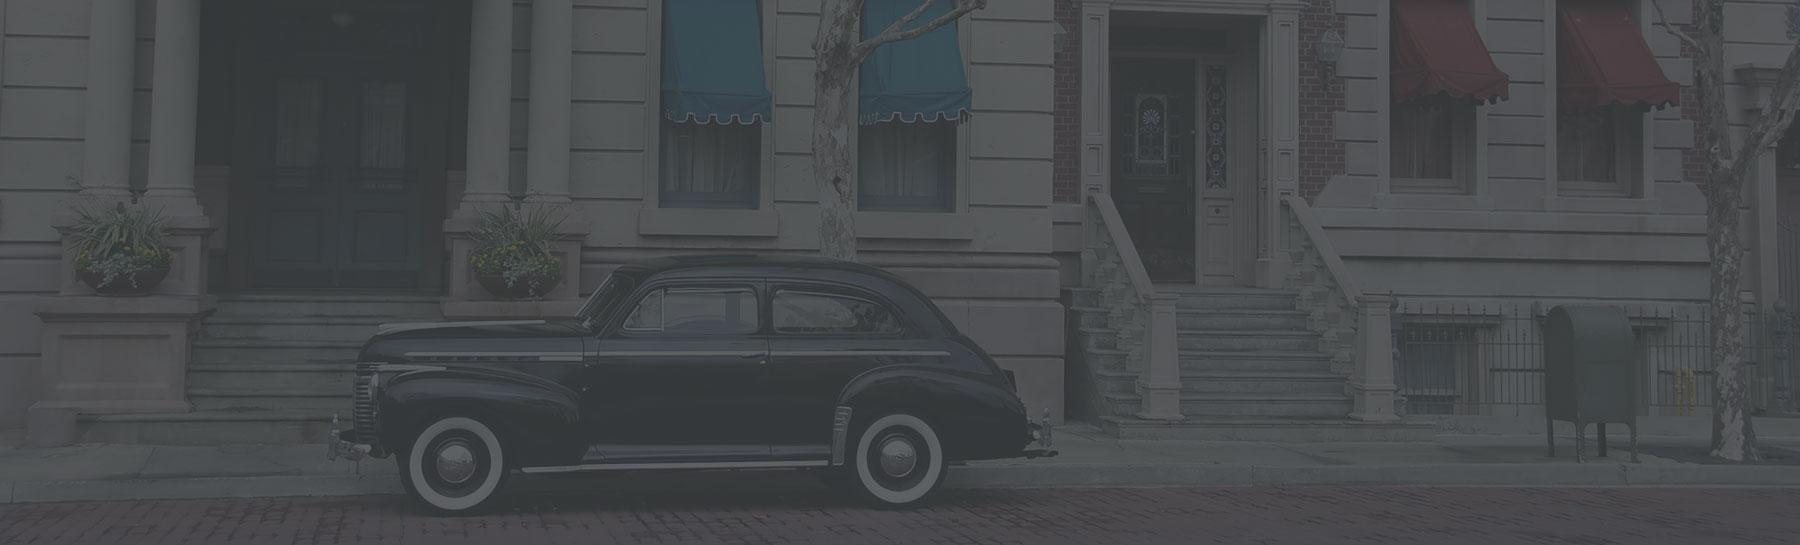 Car Insurance For Used Cars Vs New Vehicles The Zebra